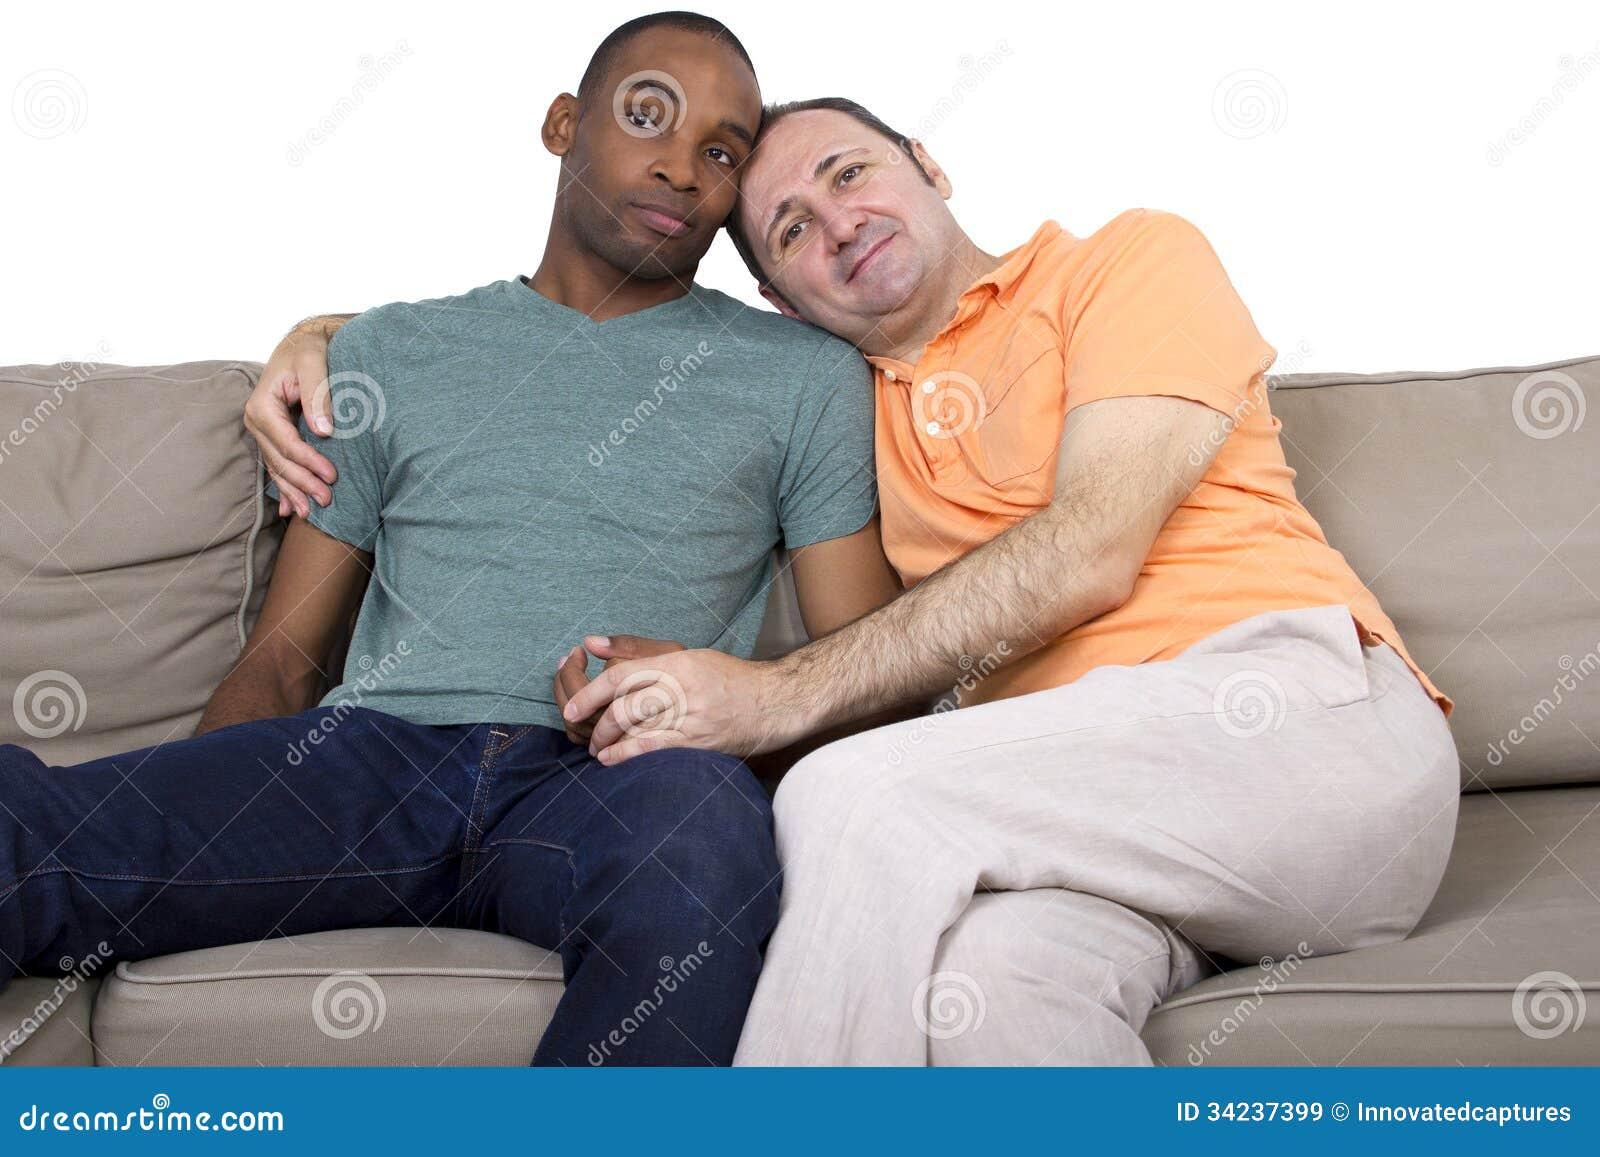 gay twinks bondage